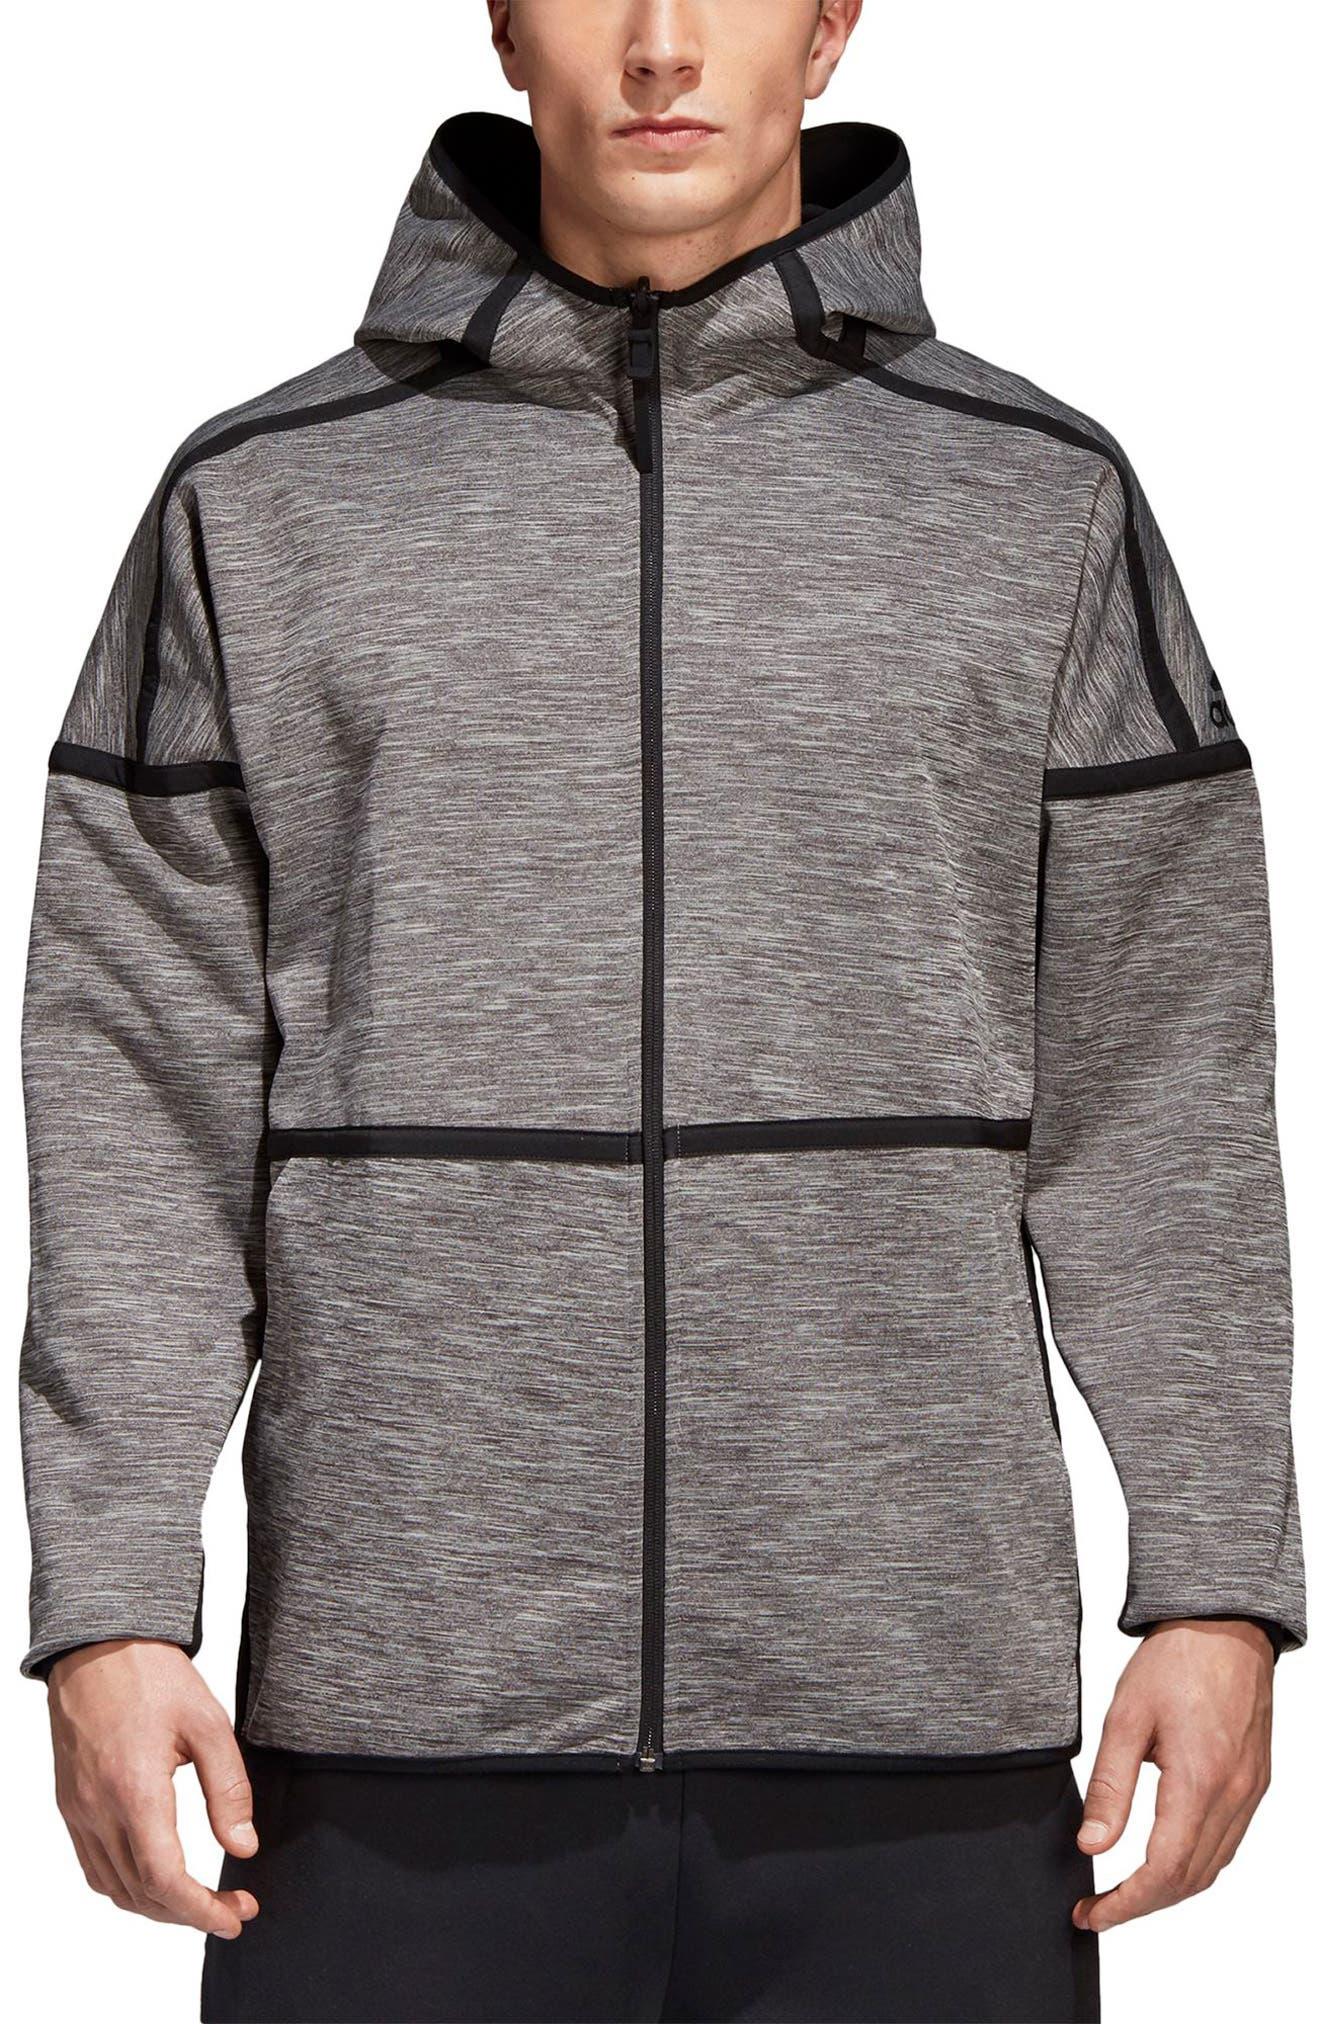 adidas ZNE Regular Fit Reversible Hooded Jacket